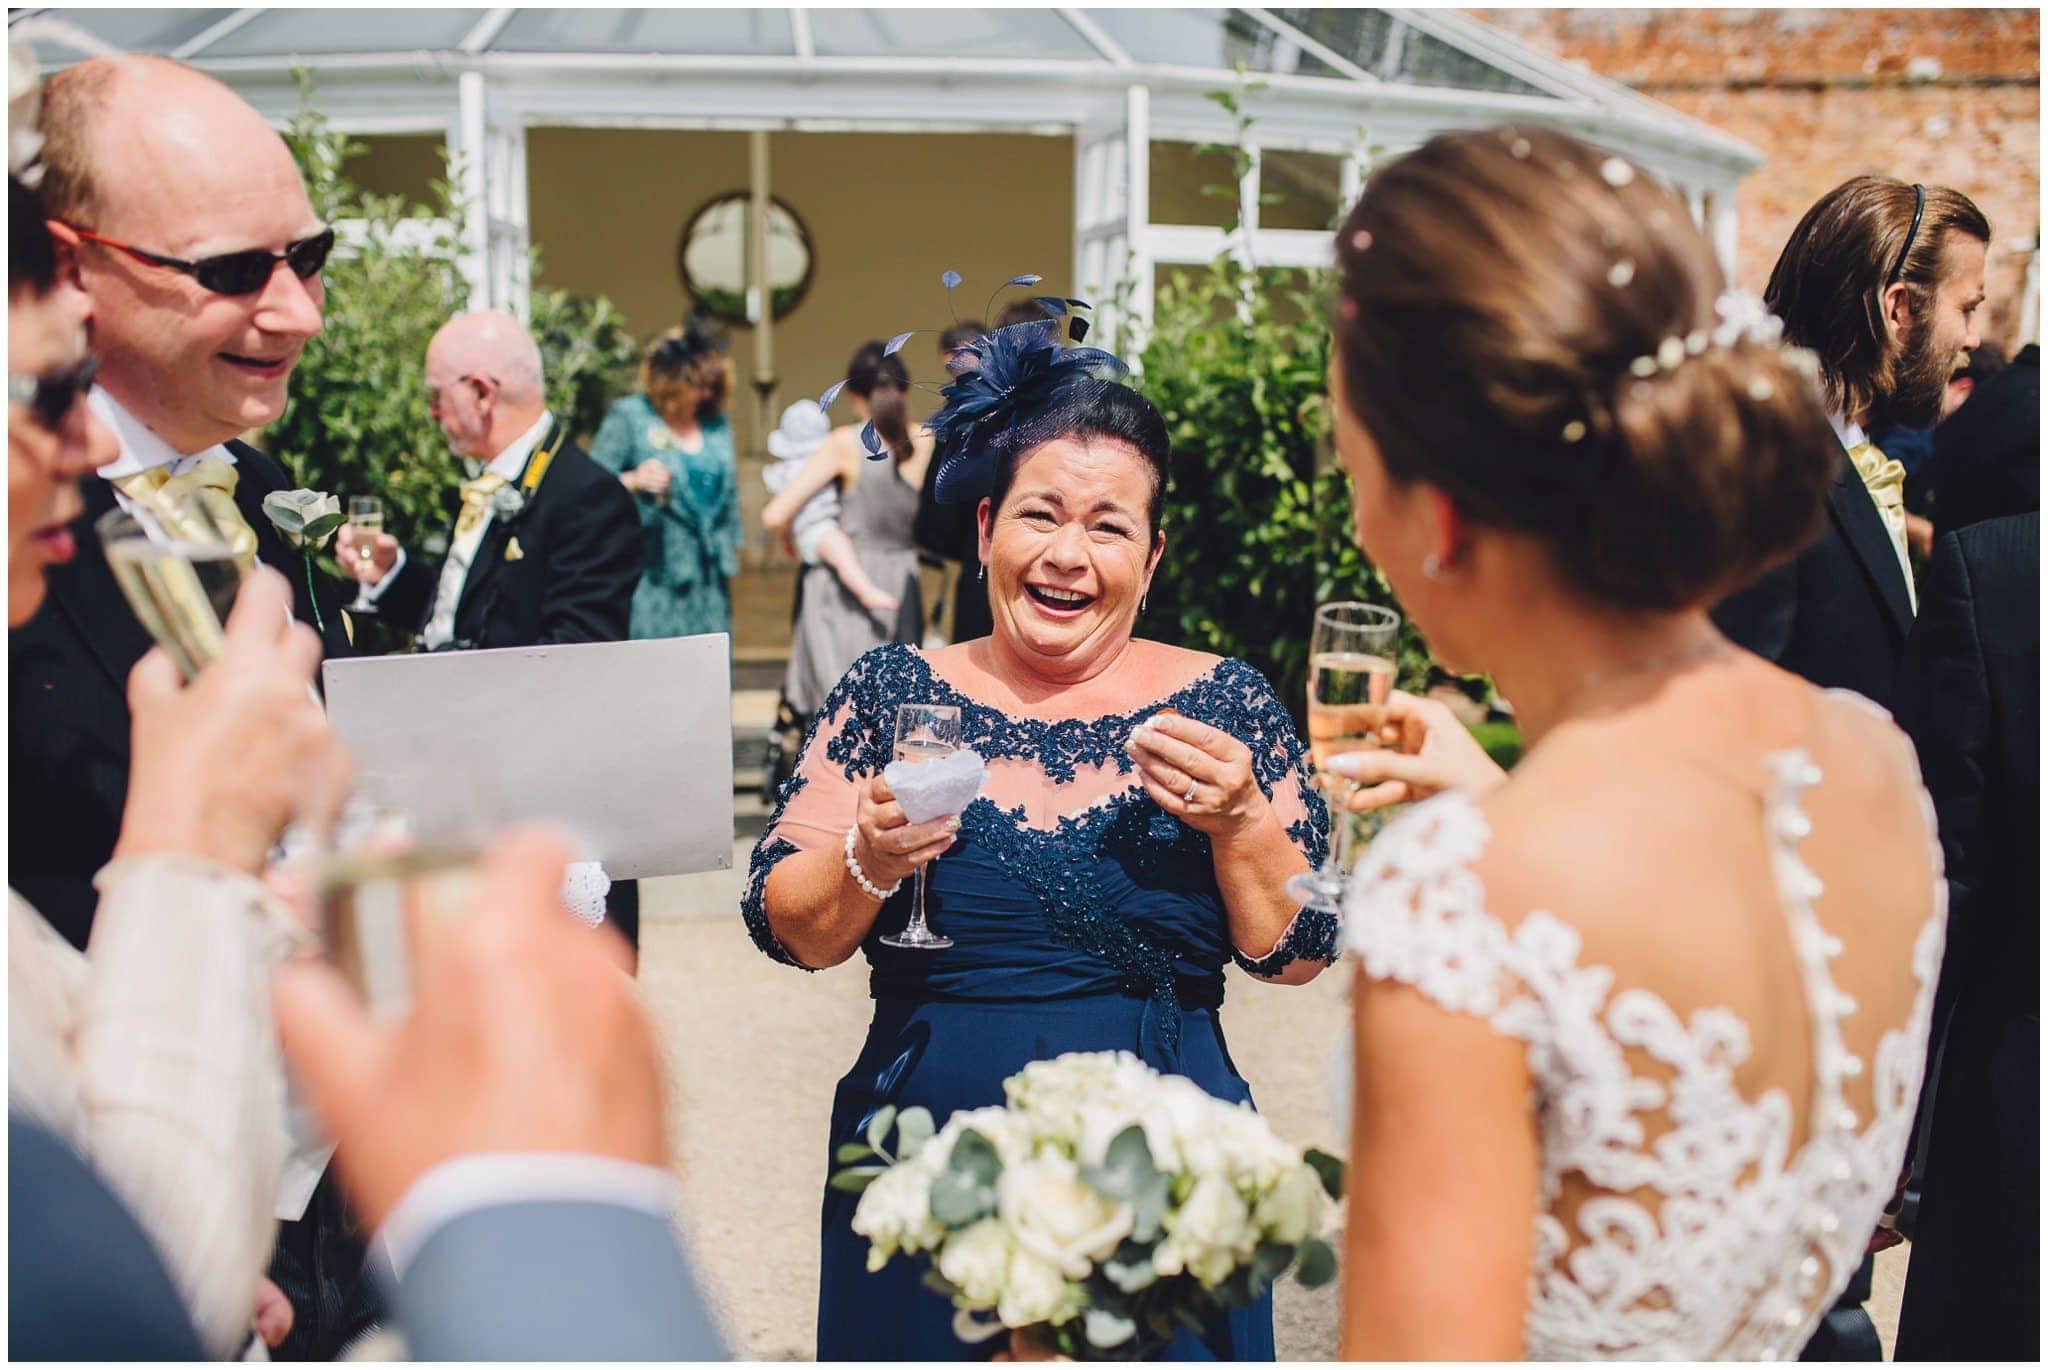 combermere-abbey-wedding-photographer-56